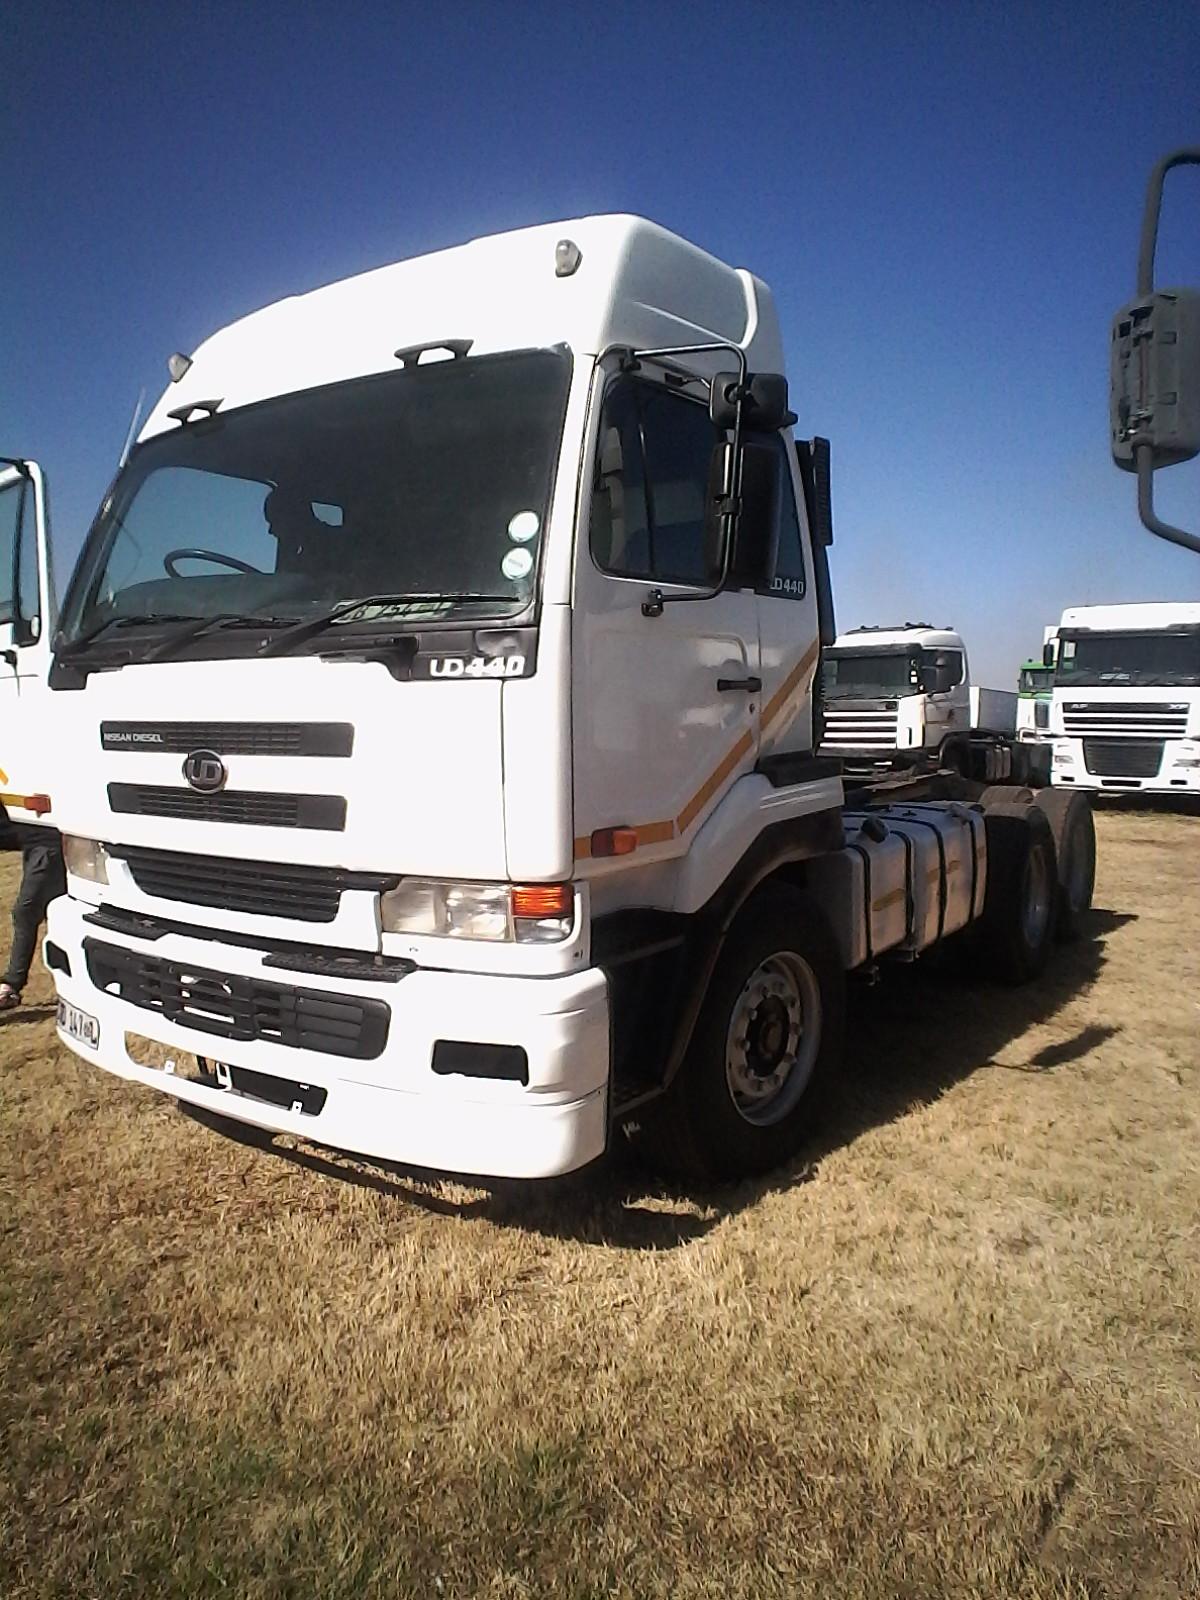 Nissan Diesel Truck >> Nissan Ud Trucks On Special Junk Mail